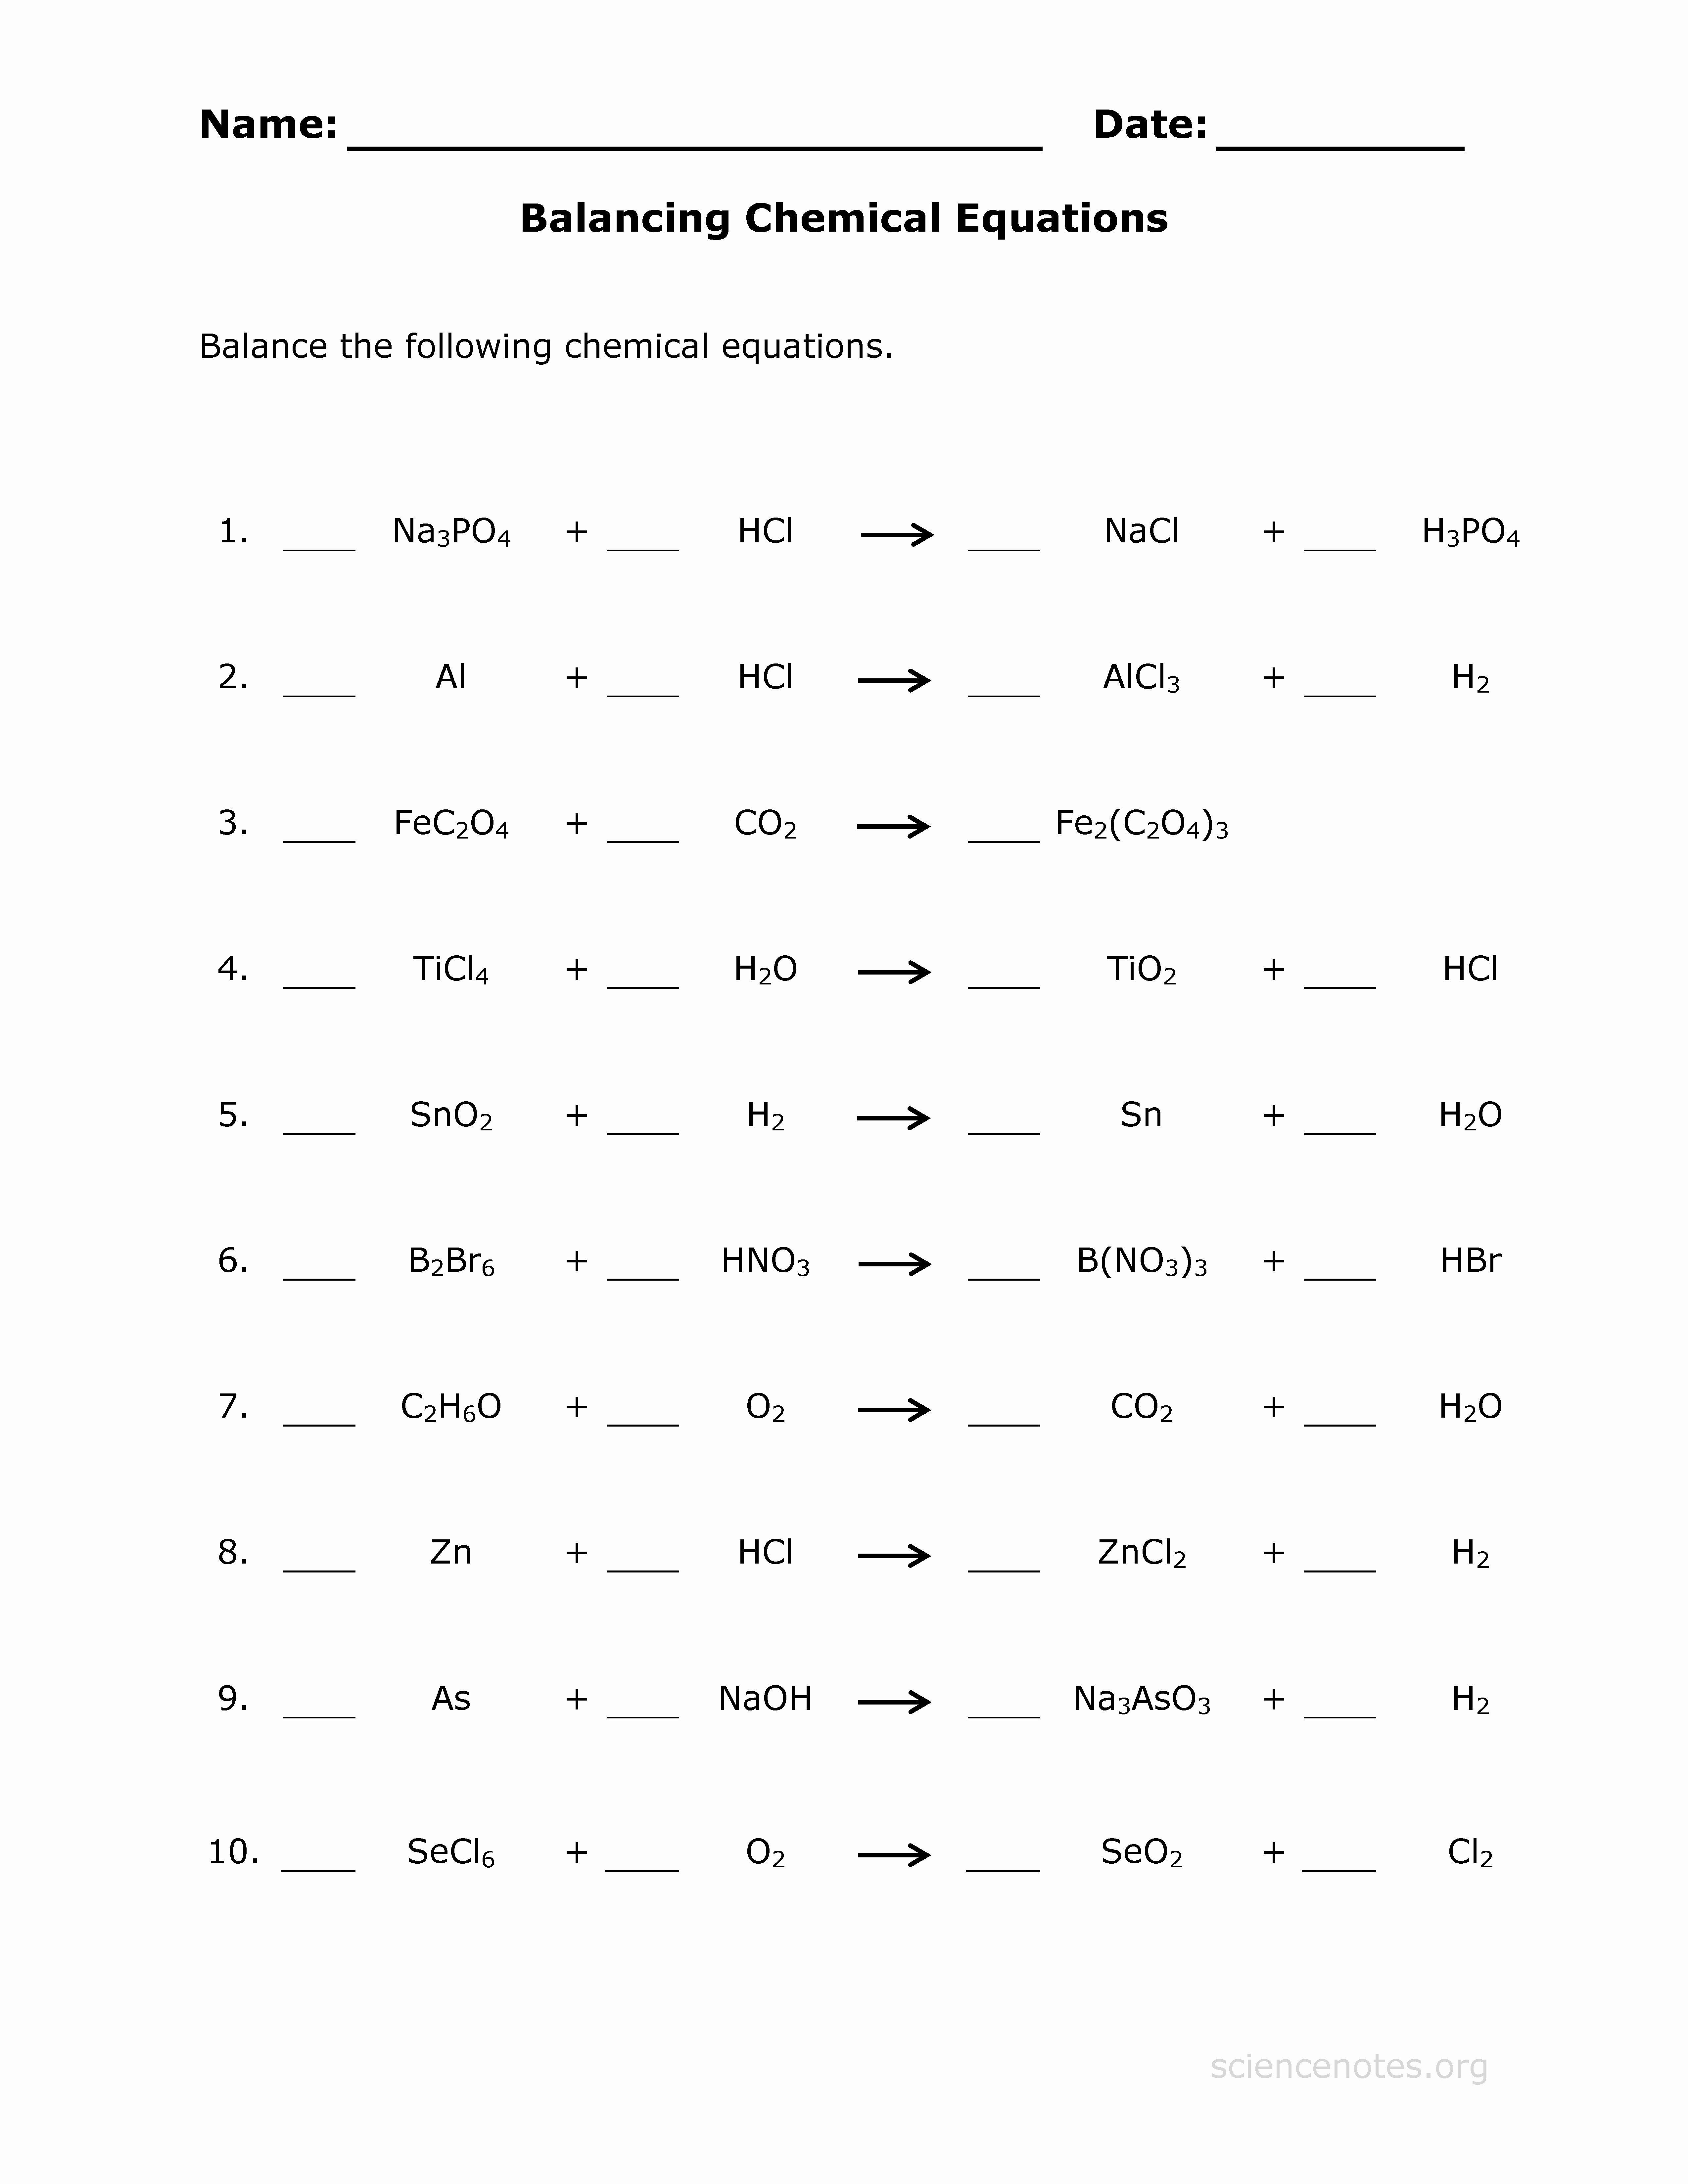 Balancing Chemical Equation Worksheet Lovely Balance